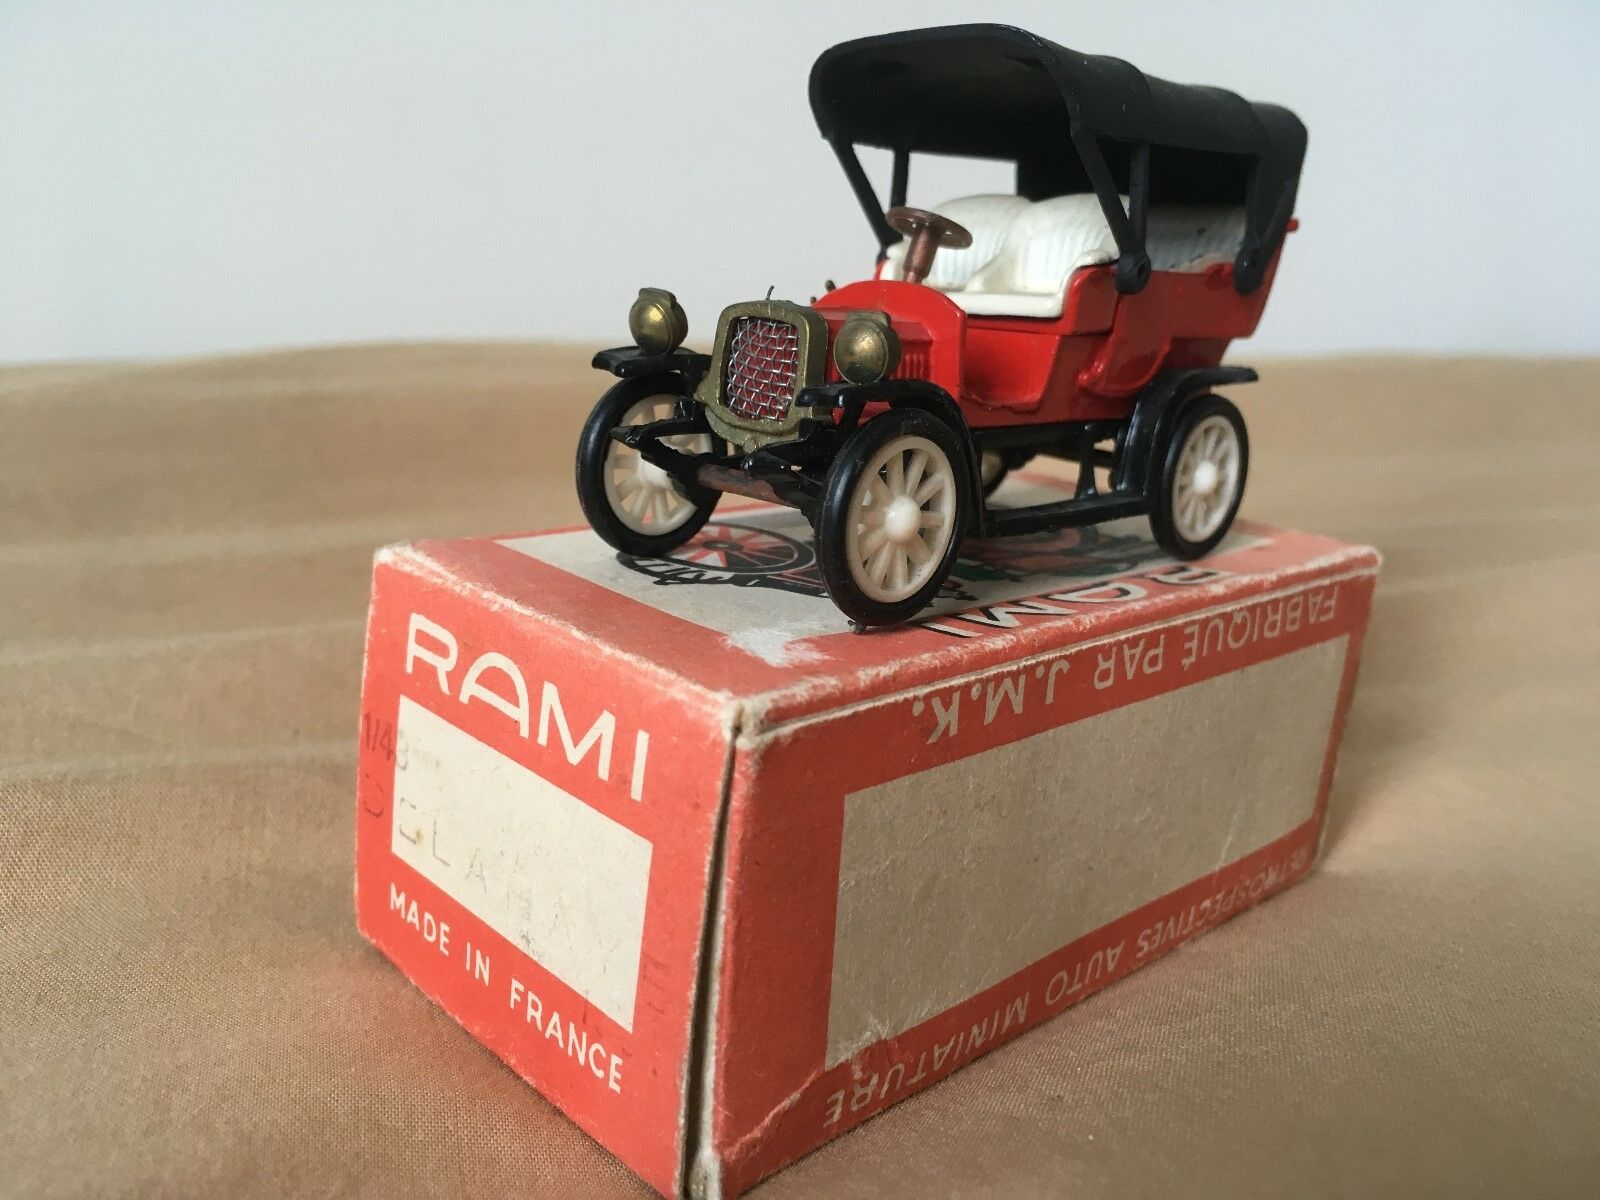 Old miniature rami jmk Delahaye 1904 r.a.m.i. 1 43 j.m.k.